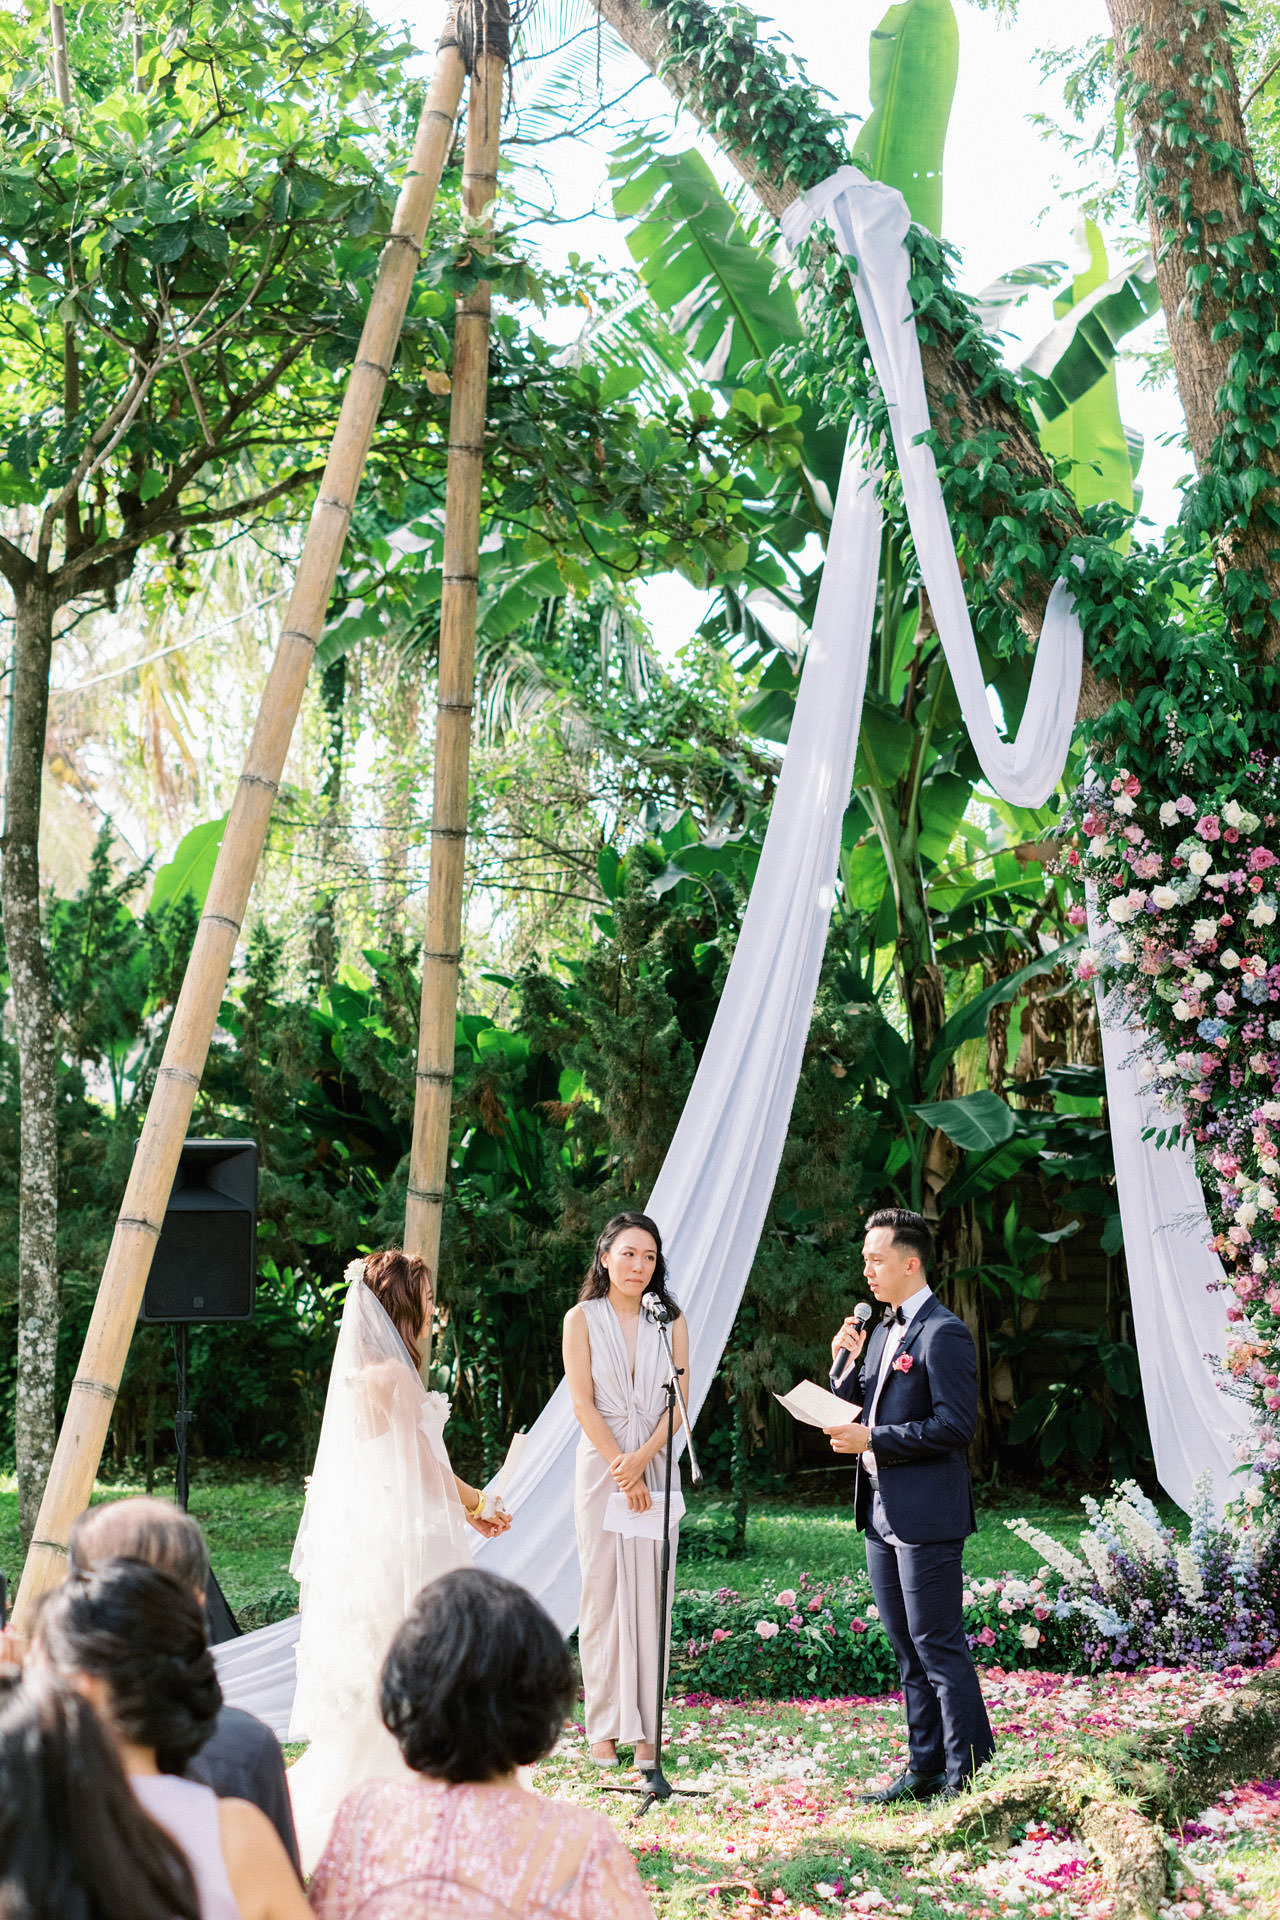 Whimsical Bali Forest Wedding at Puri Nirwana  37